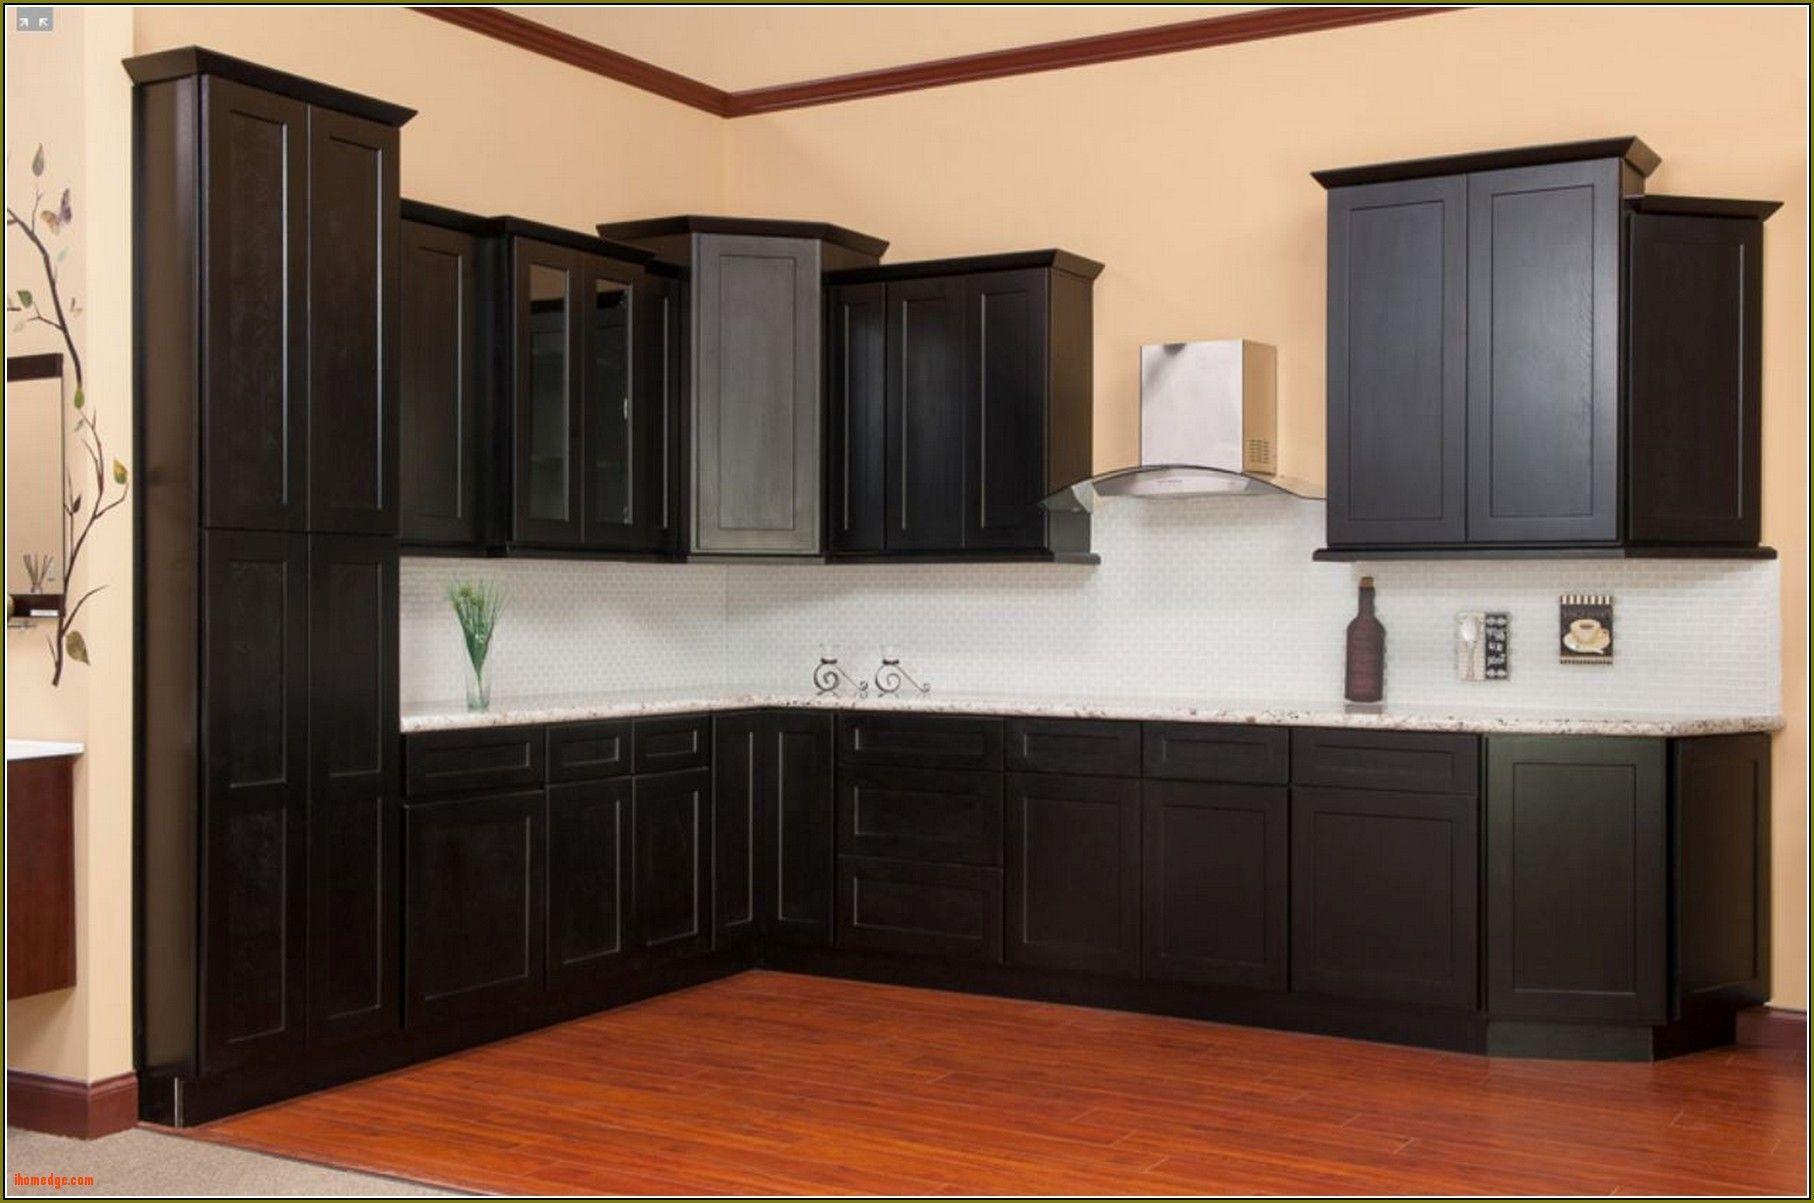 Inspirational Wonderful Home Depot Cabinets , Home Depot ...